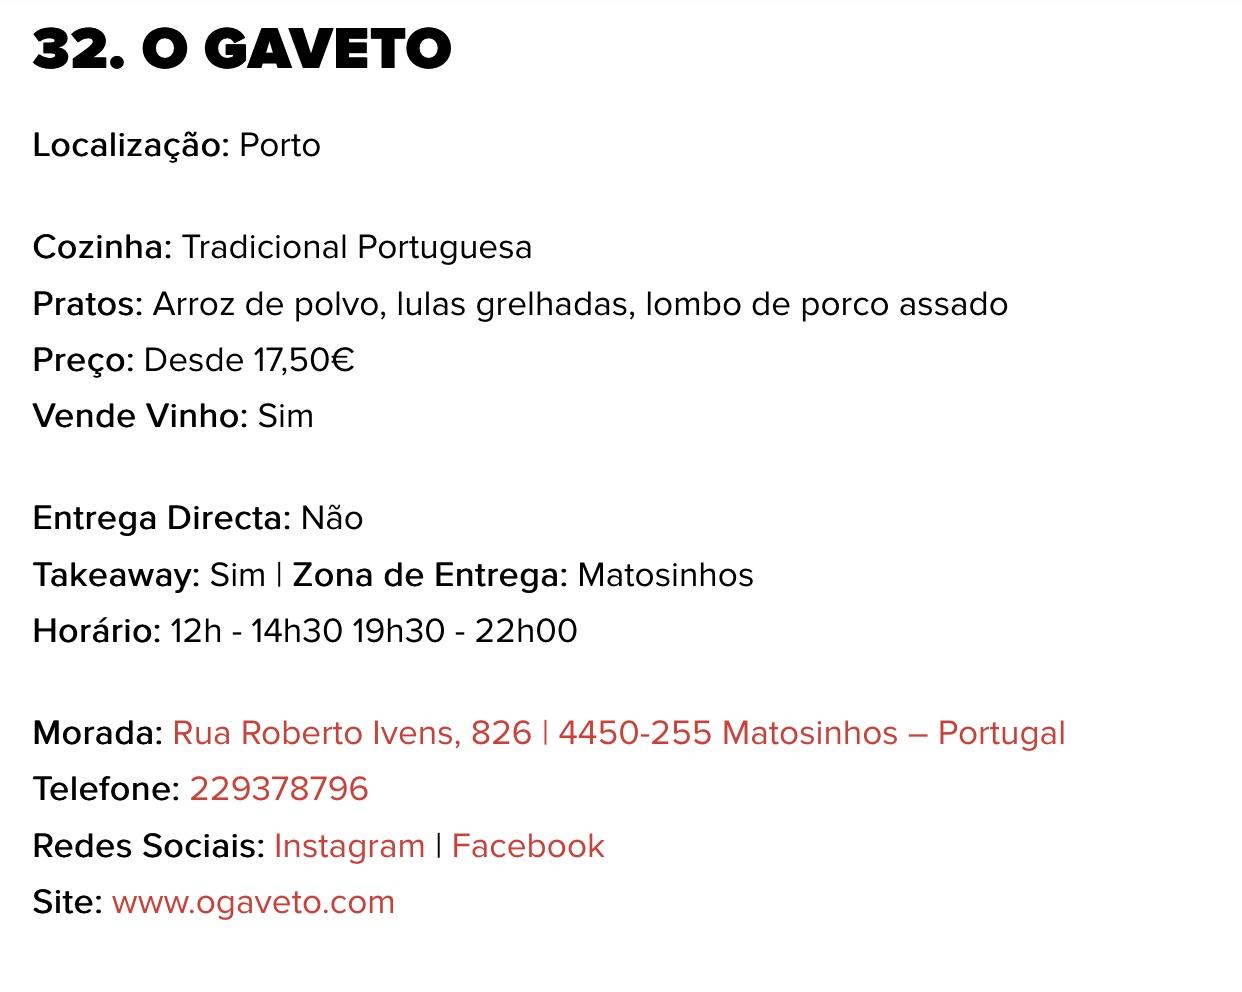 O Gaveto - details